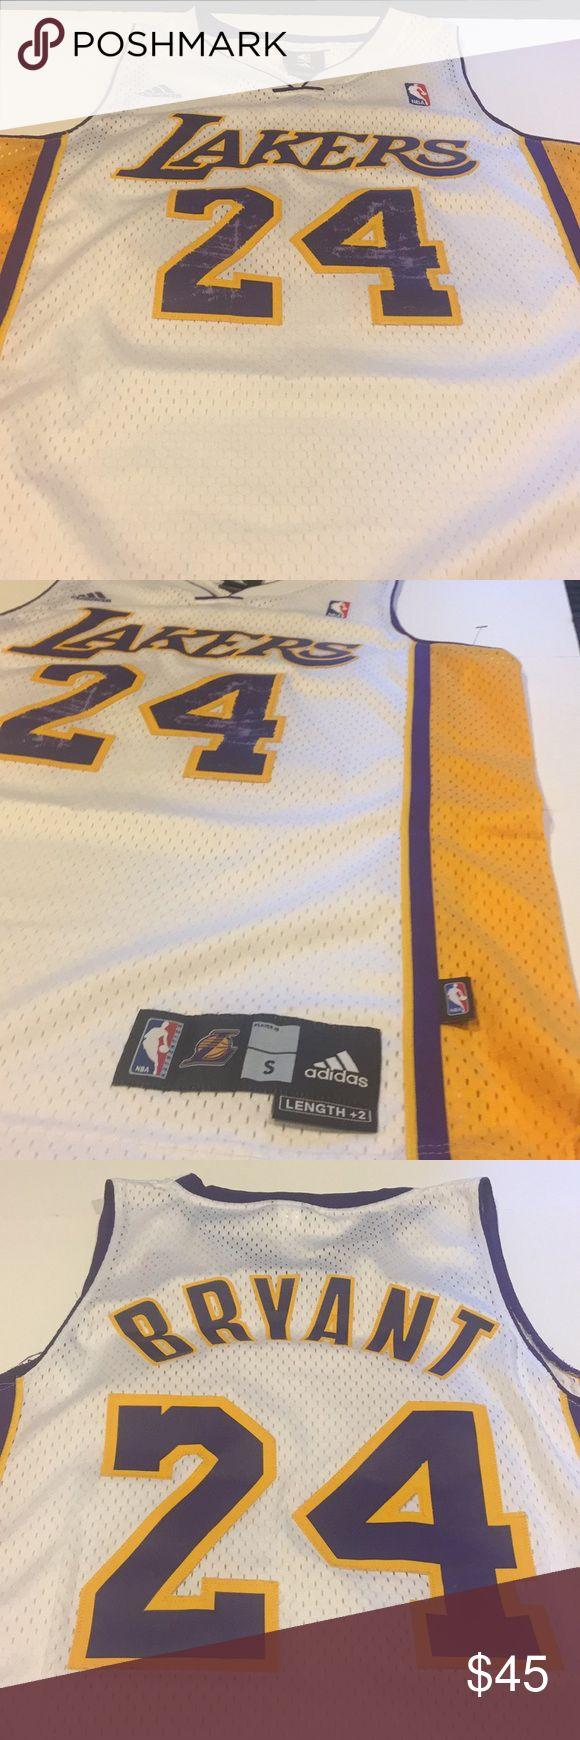 Men's Adidas NBA Kobe Bryant Sleeveless Mesh Kobe Bryant #24 adidas NBA Authentic's Sleeveless Mesh Jersey top.  Tag reads Size Small Length +2 Addidas NBA Authentics Shirts Tank Tops